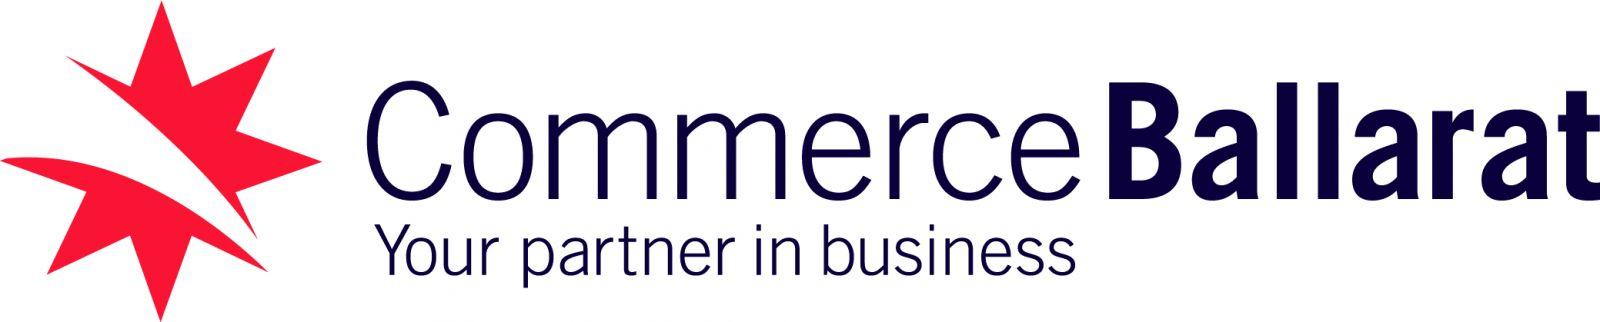 CommerceBallarat Logo 1